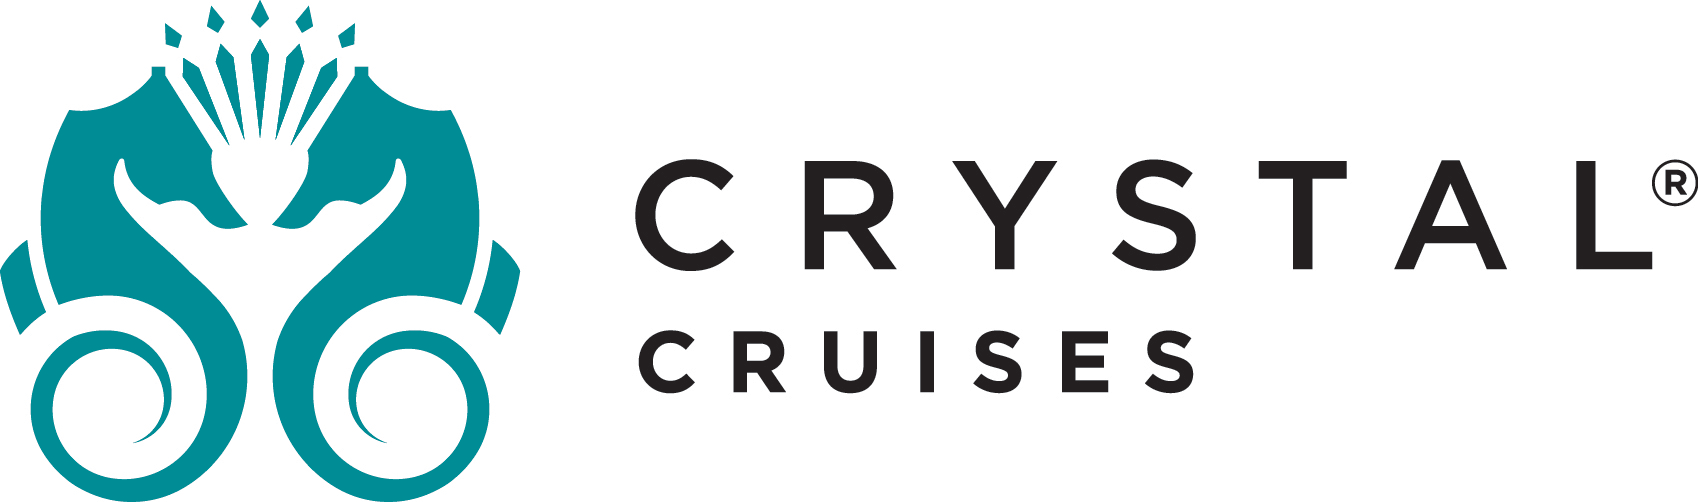 cc_cruises_logo_horiz_321_blk_highres-2